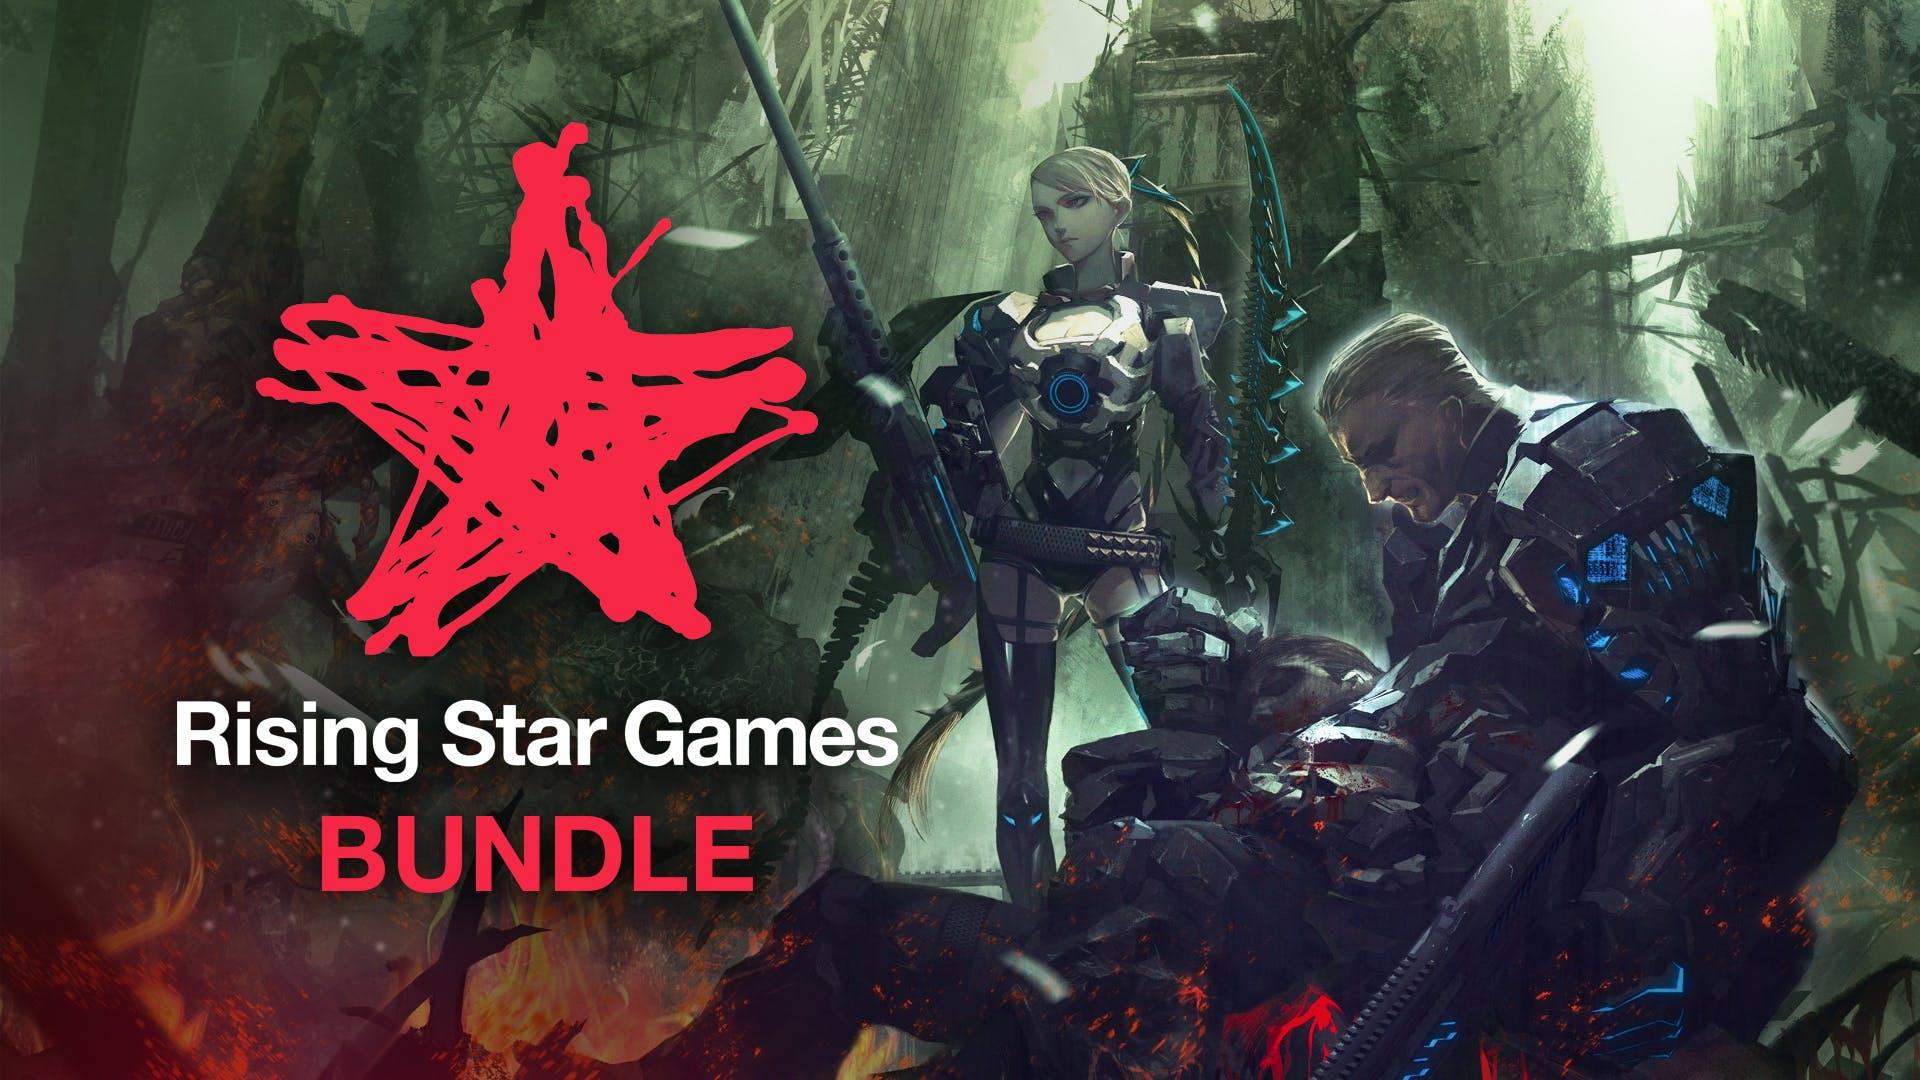 Rising Star Games Bundle